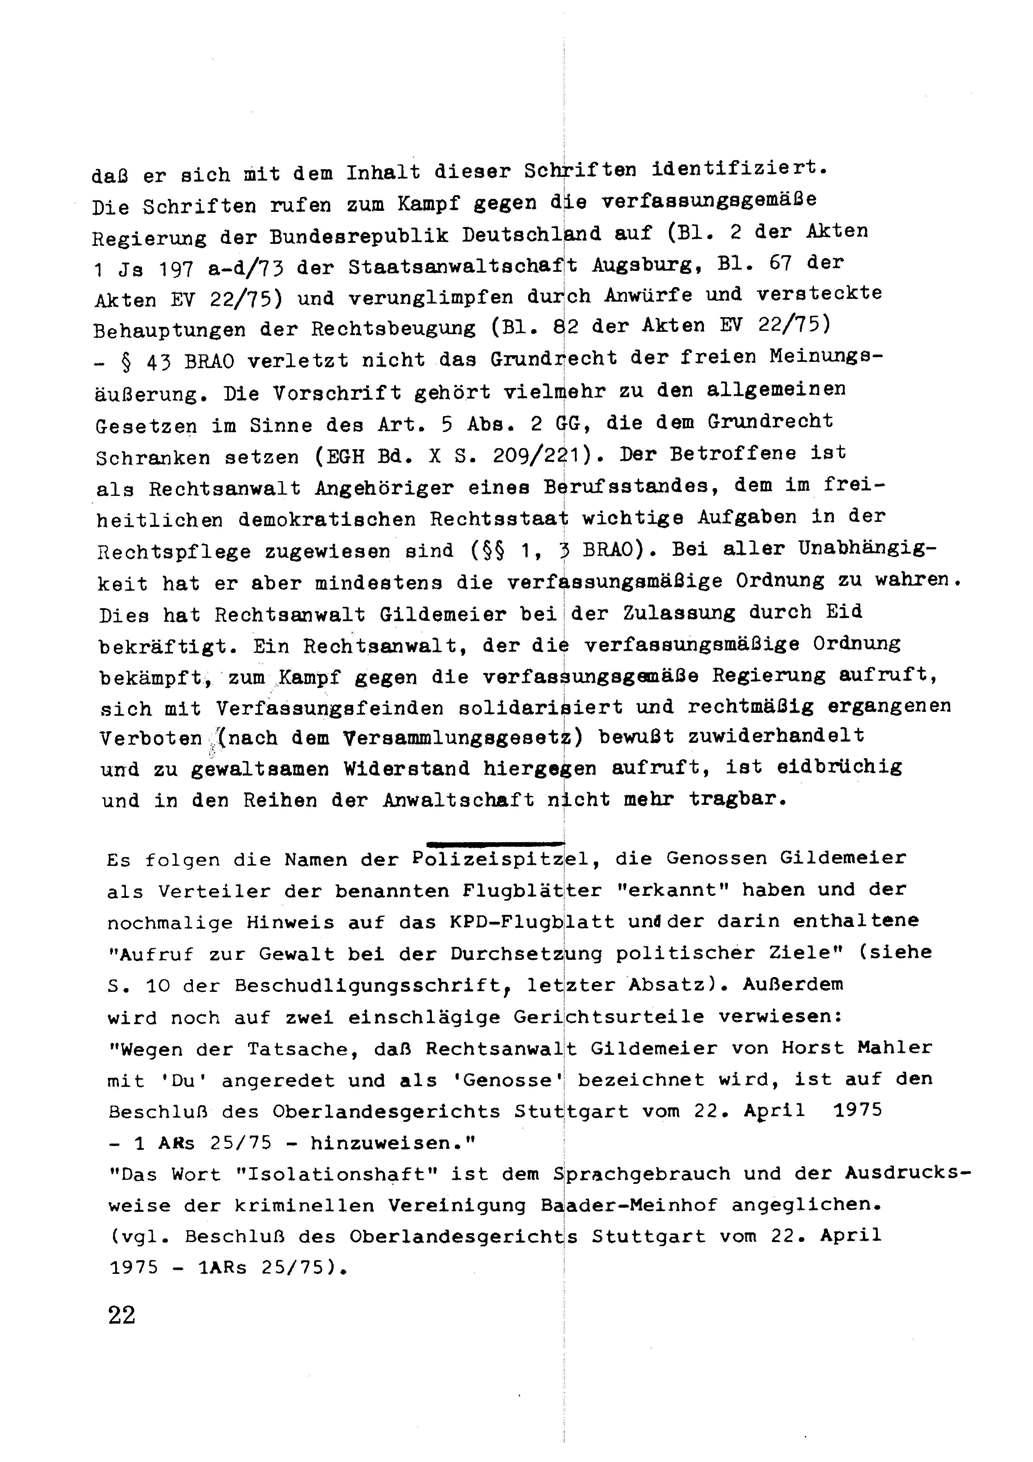 RHeV_Anschuldigung_RA_Gildemeier_Seite_22